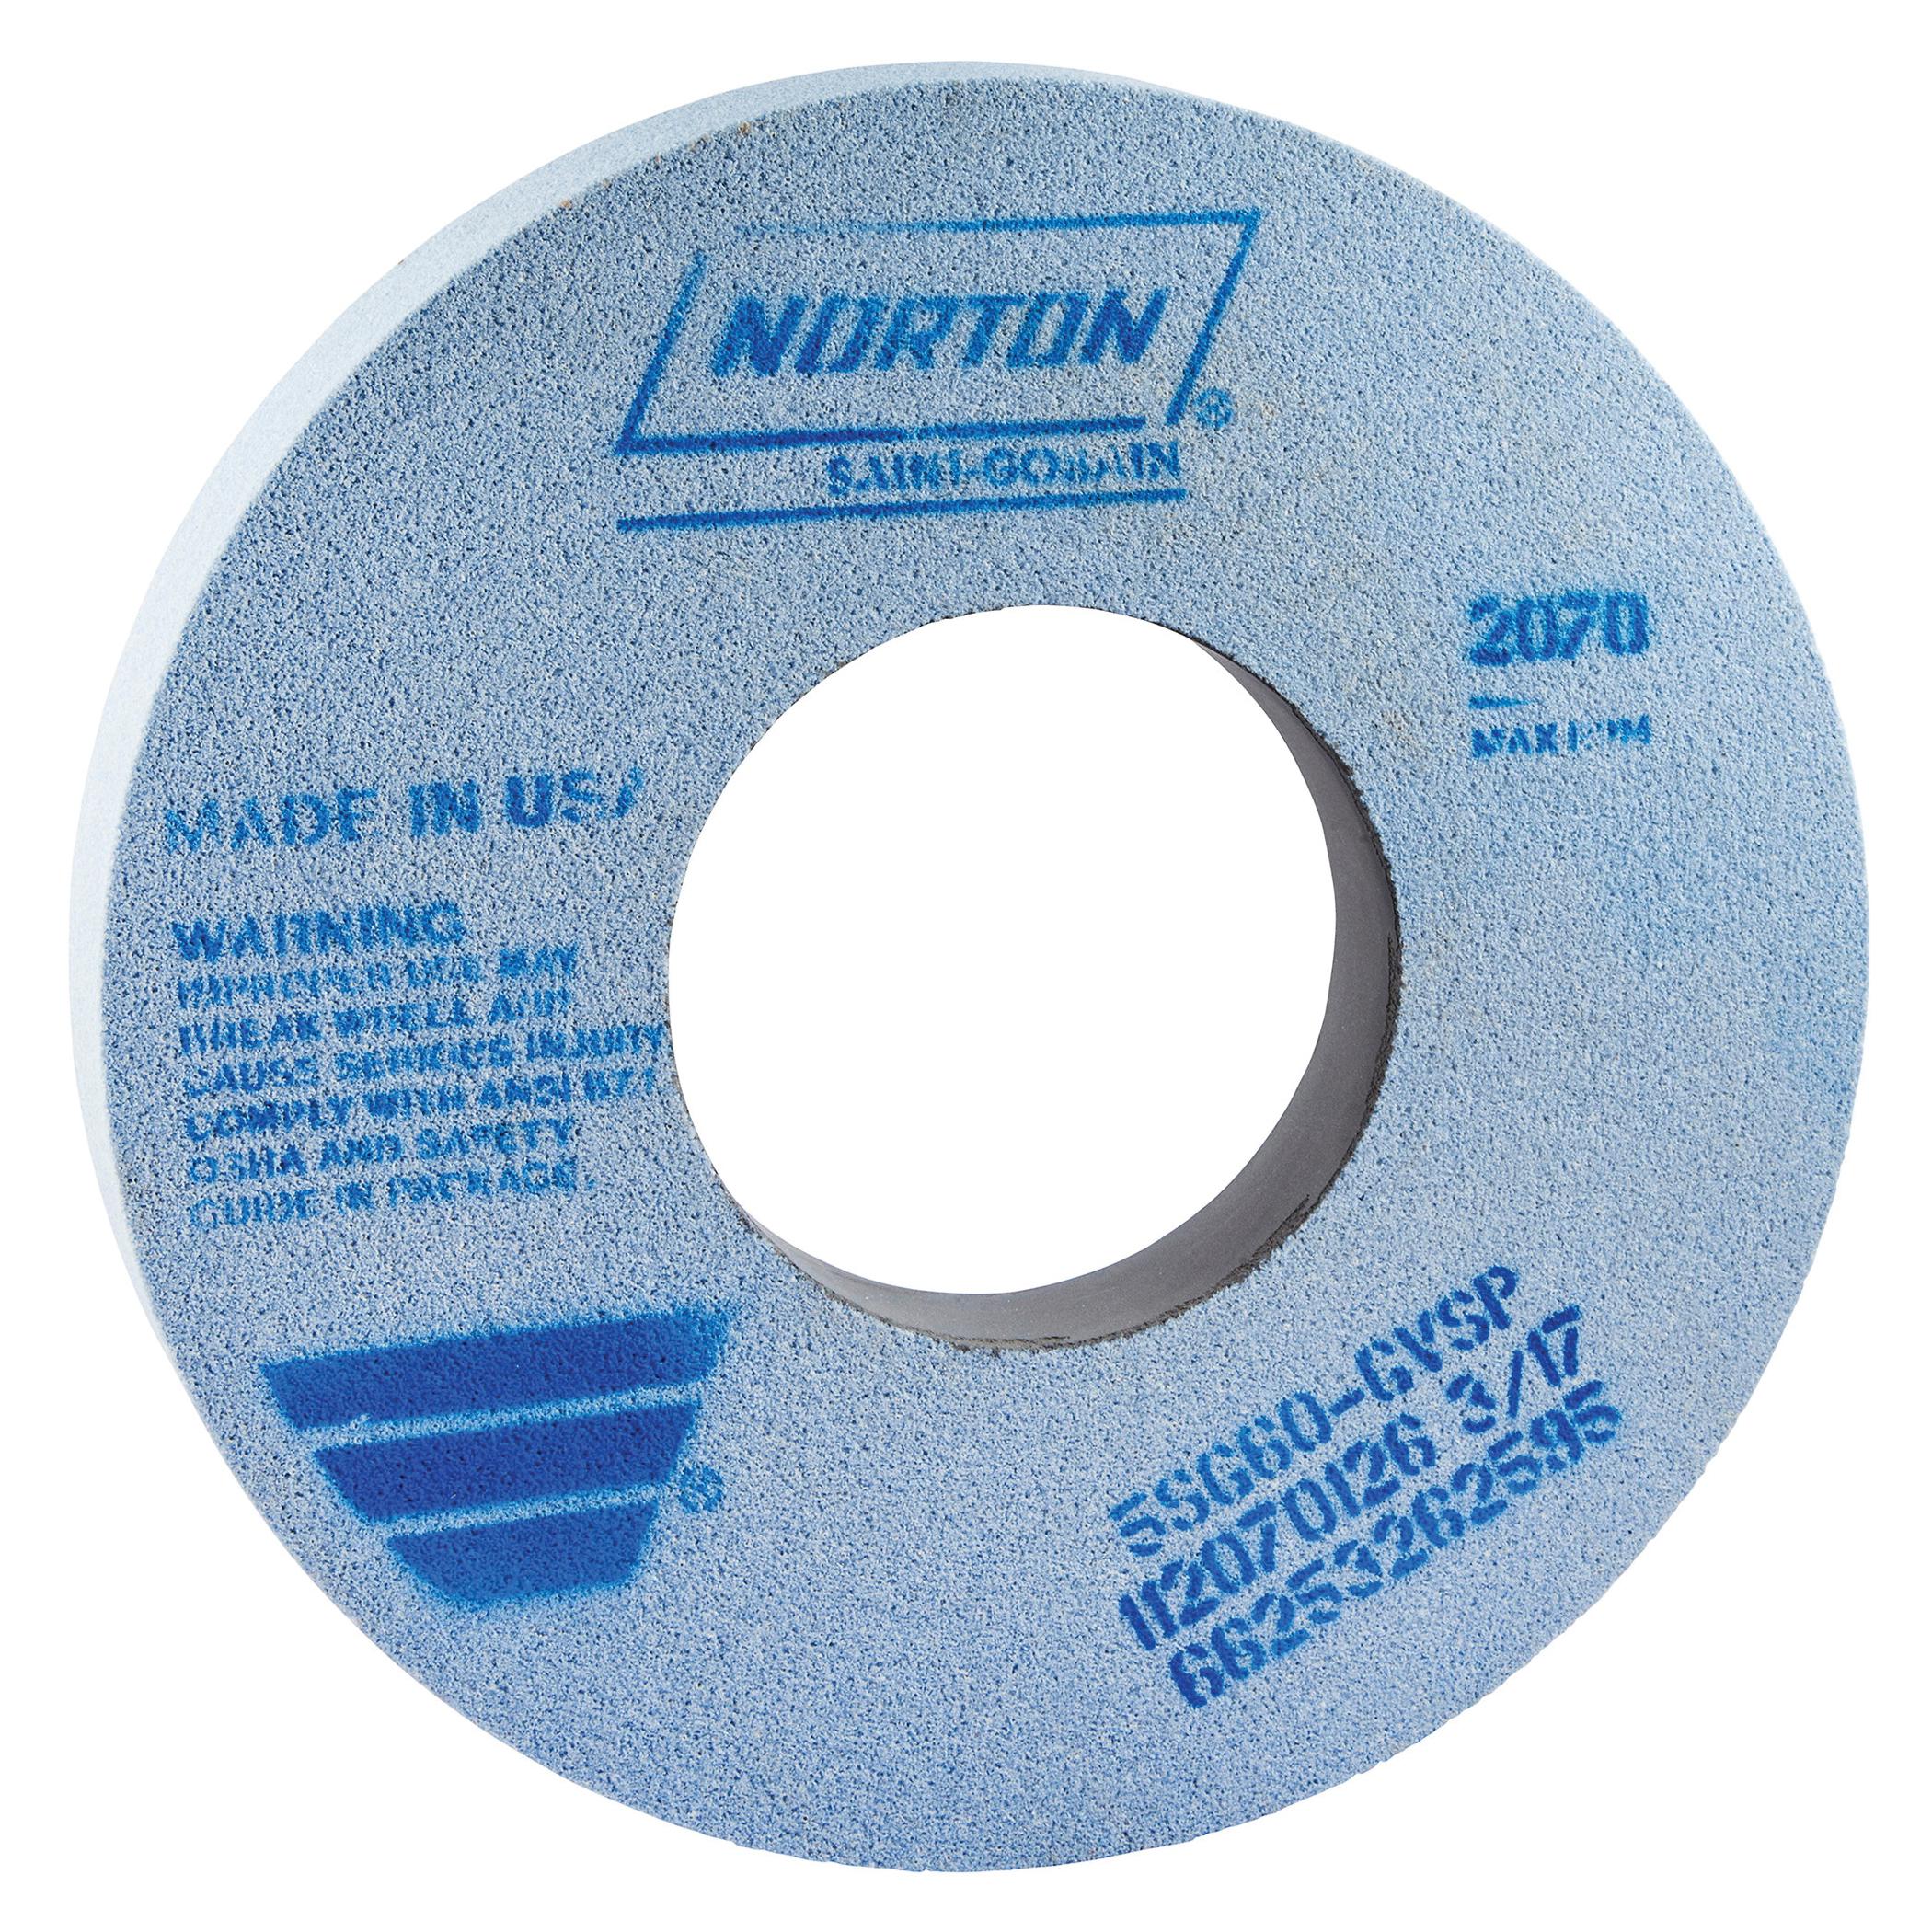 Norton® 66253262594 5SG Straight Toolroom Wheel, 12 in Dia x 1 in THK, 5 in Center Hole, 46 Grit, Ceramic Alumina/Friable Aluminum Oxide Abrasive